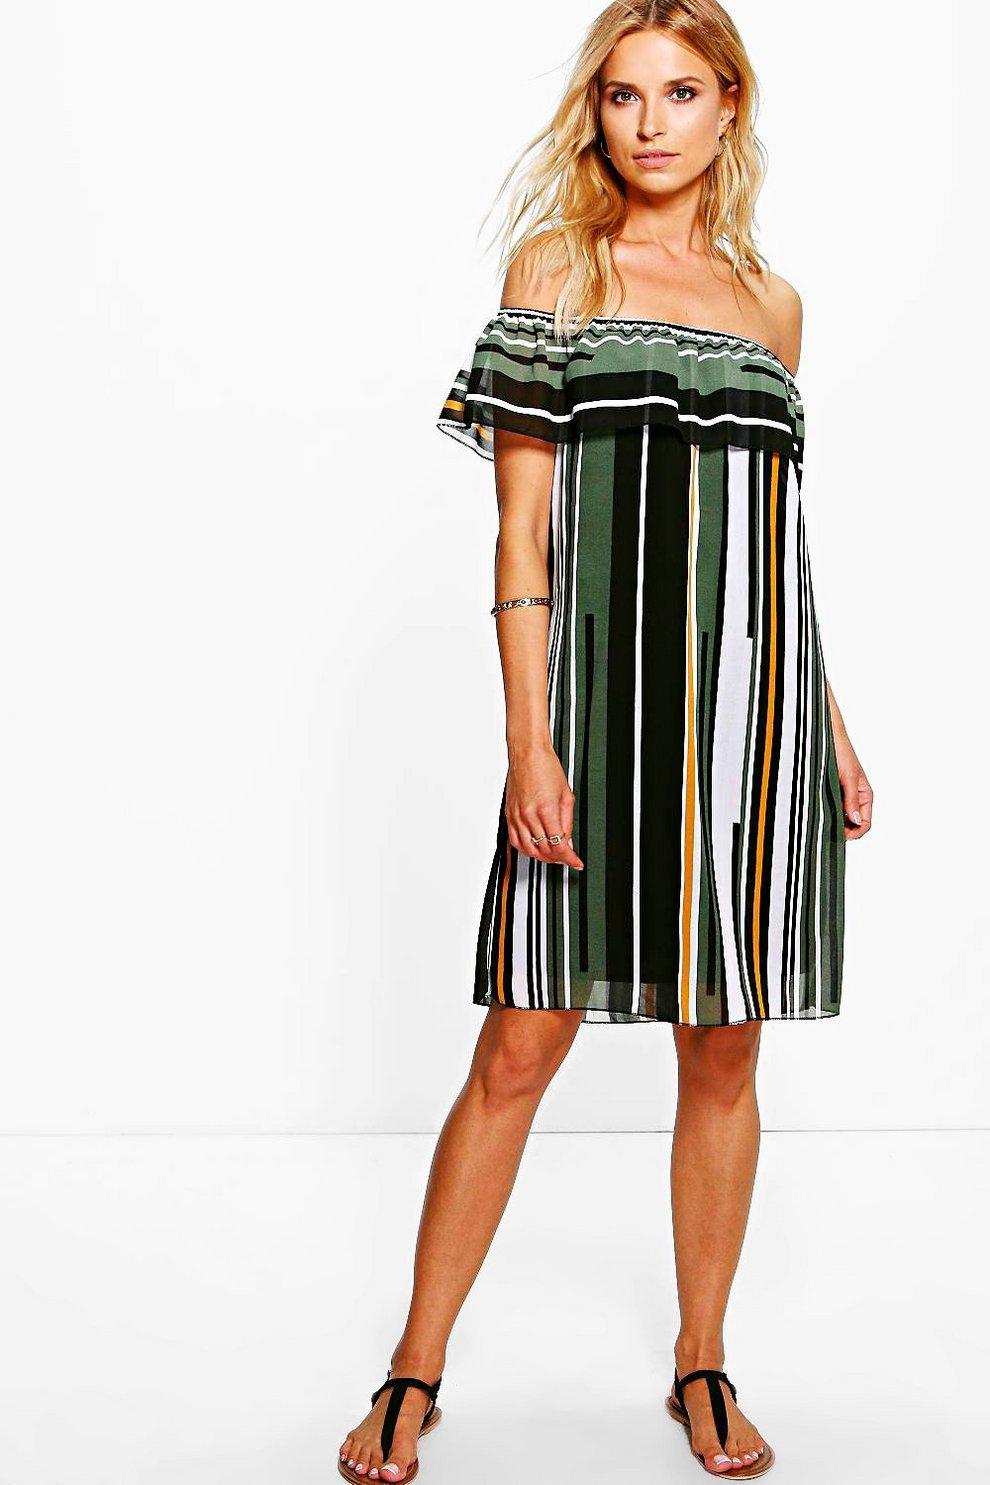 7c5efd21c3a5 Striped Off The Shoulder Dress